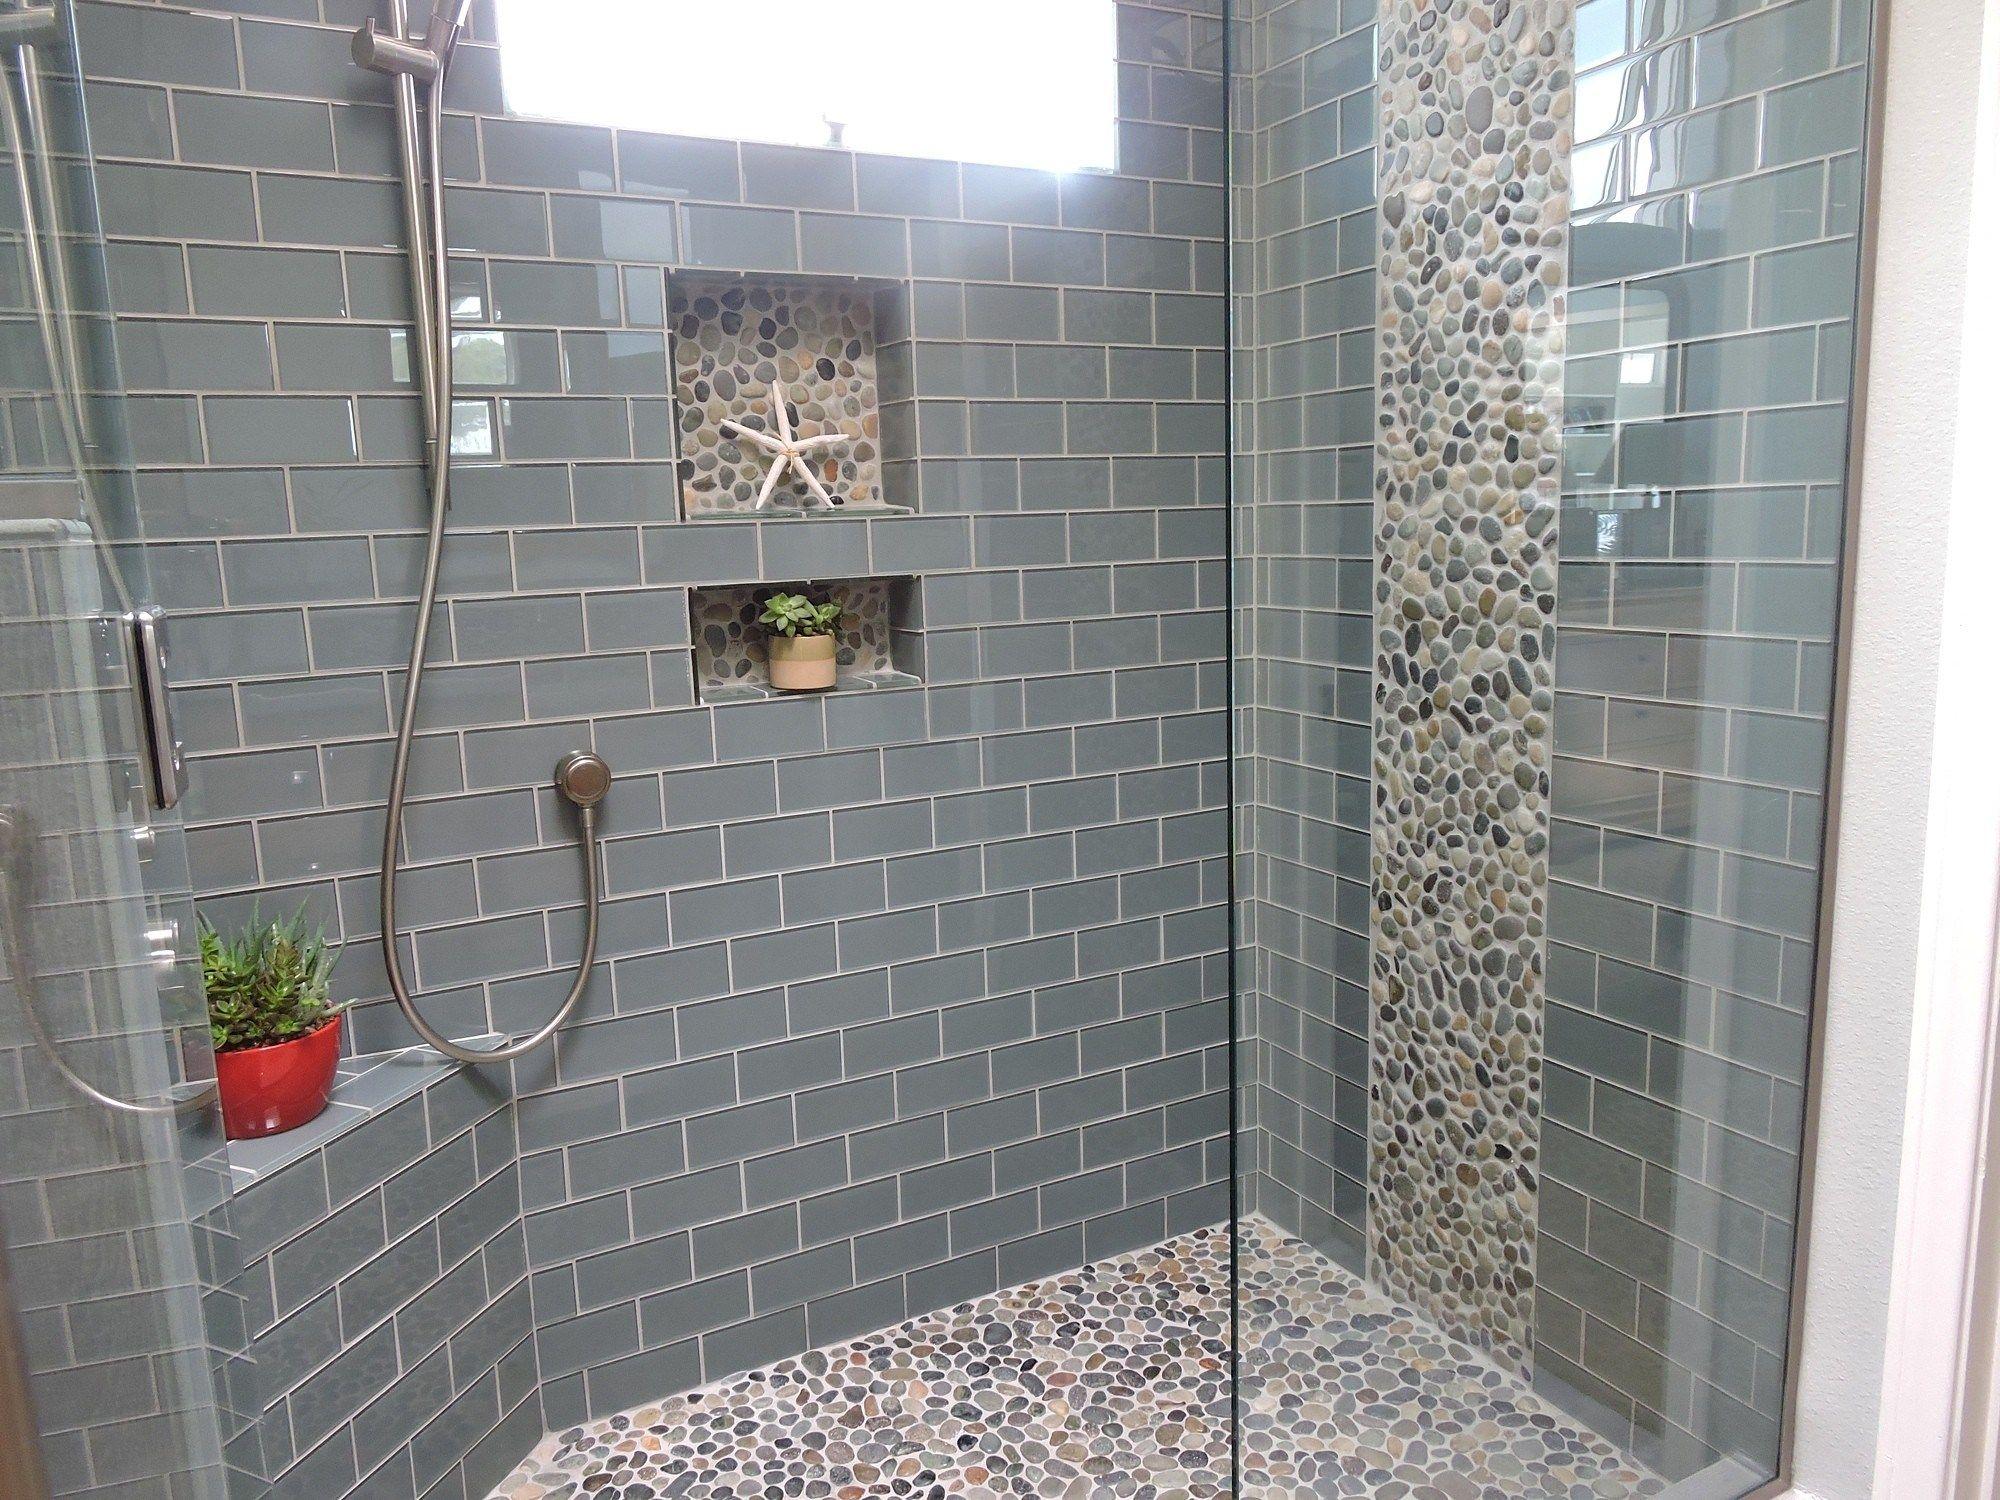 Miraculous Gray Bathroom Shower Tile on Small House Decoration Ideas